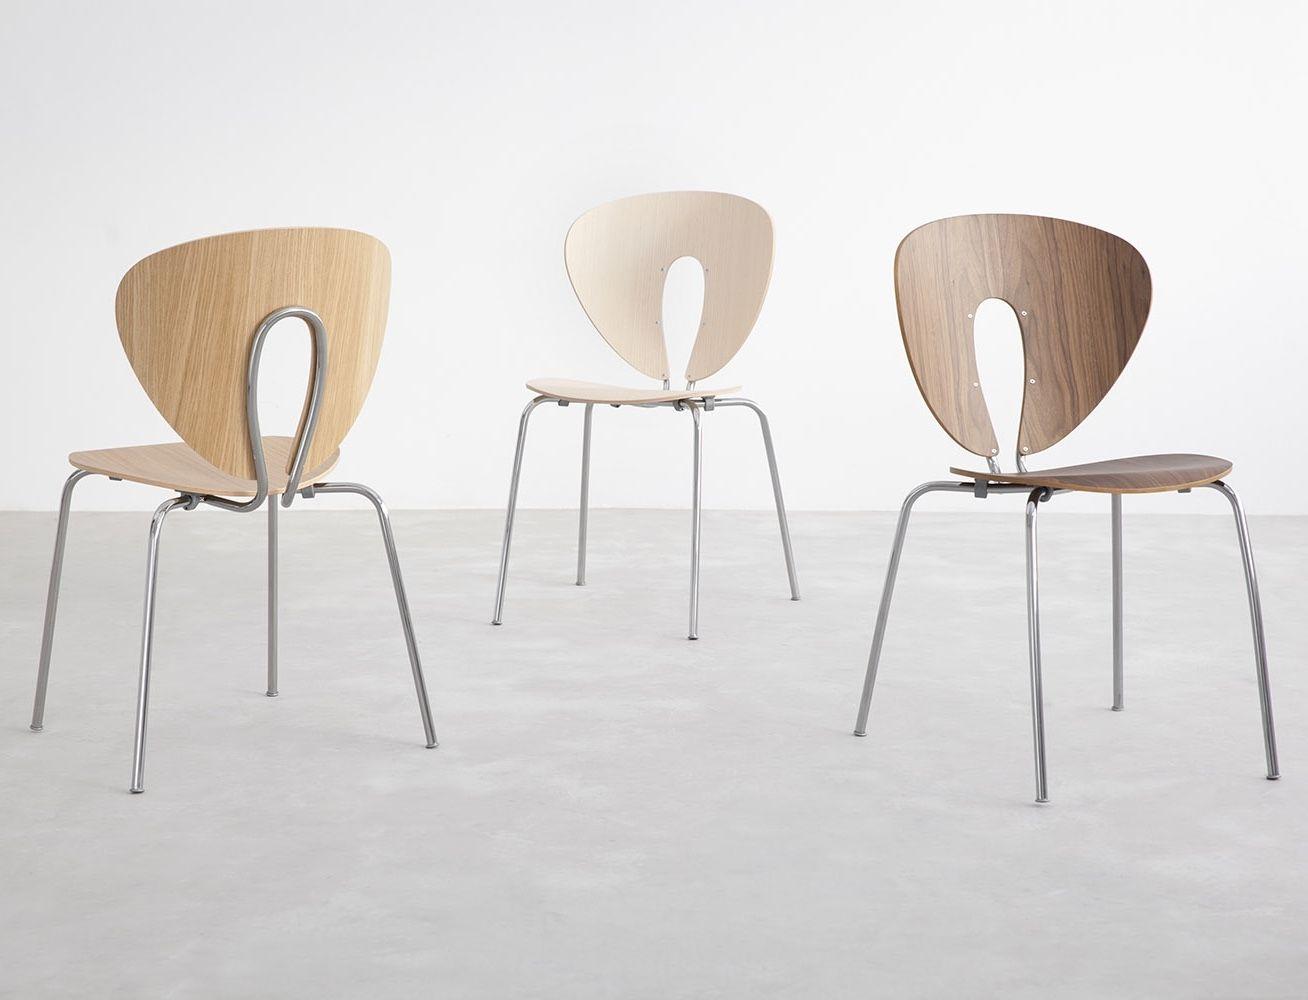 STUA Globus Wood Chair selection